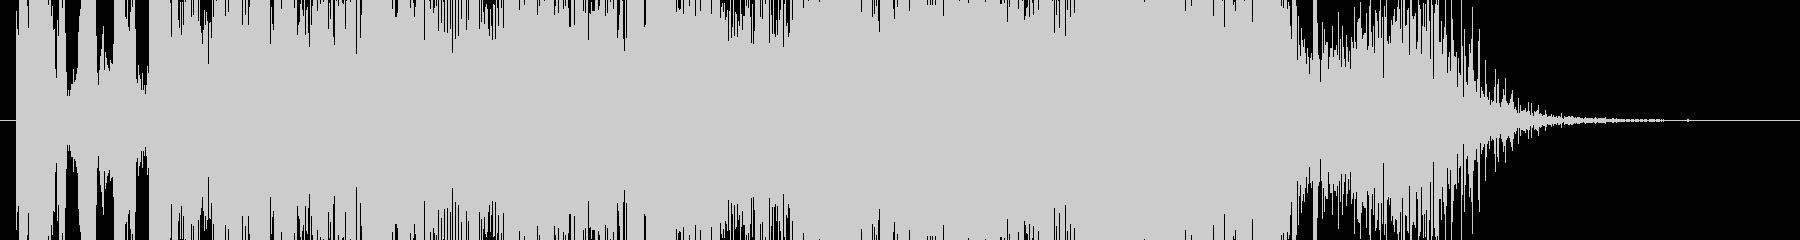 DJ Scratch and Robot_EDM Jingle's unreproduced waveform